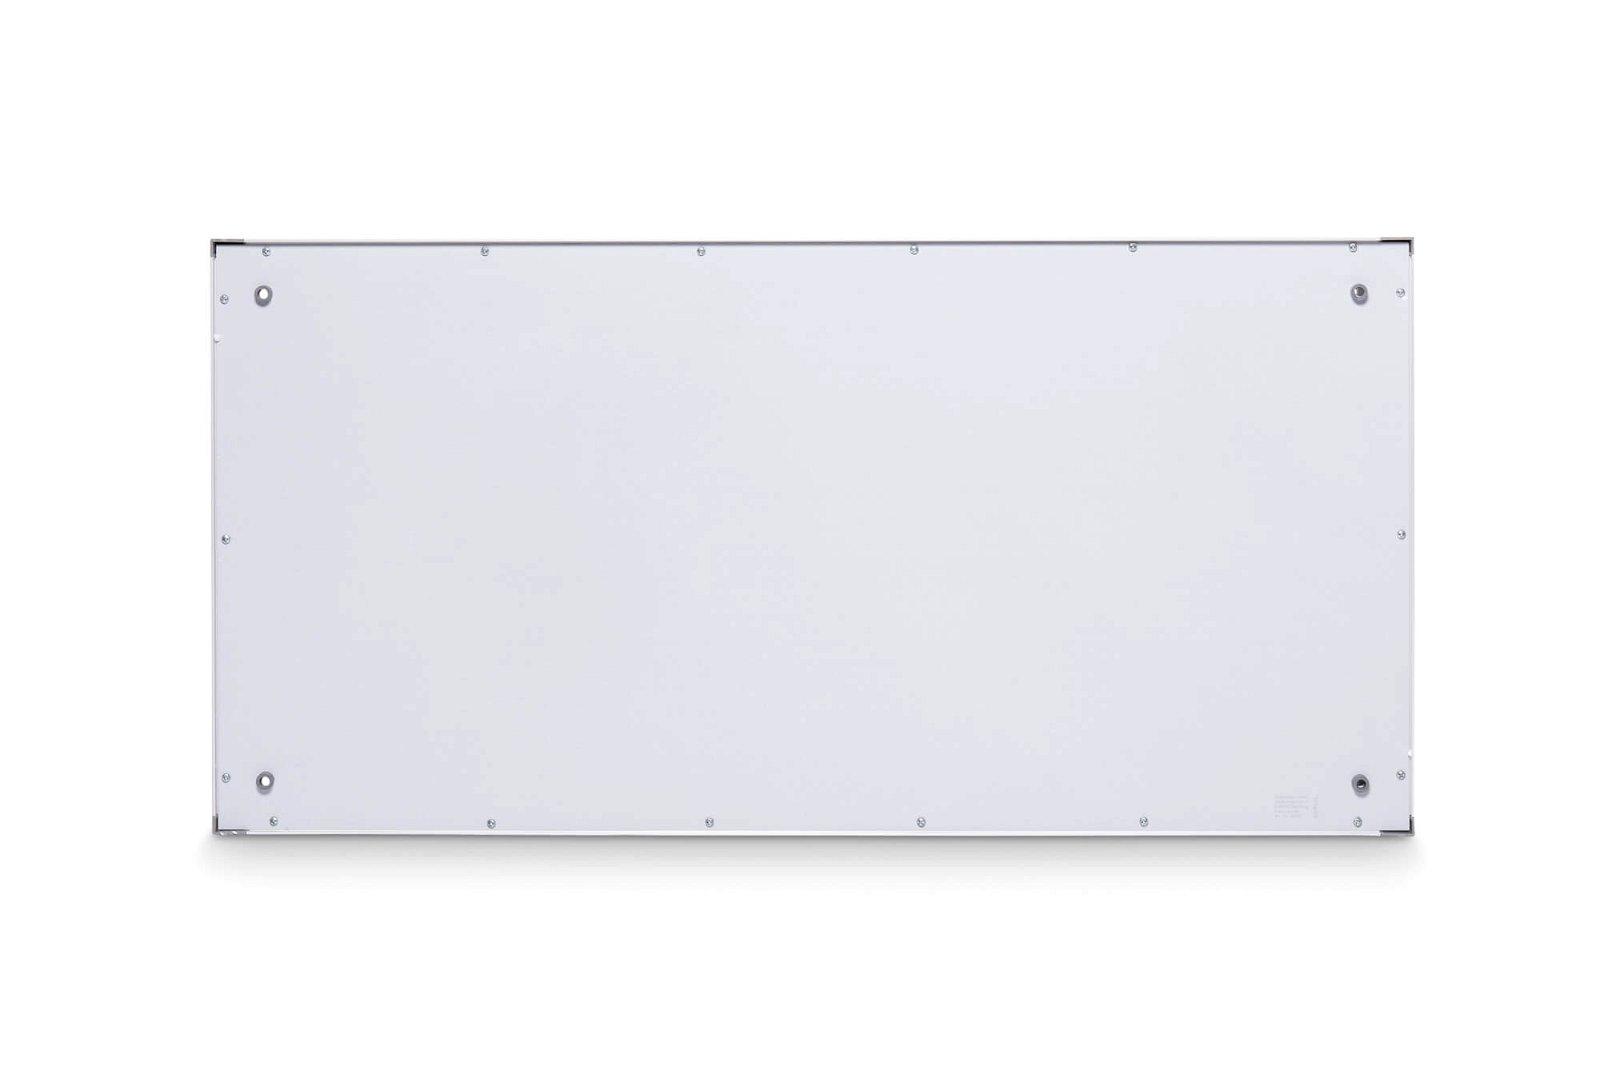 Schaukasten MAULextraslim, 3 x A4, aluminium